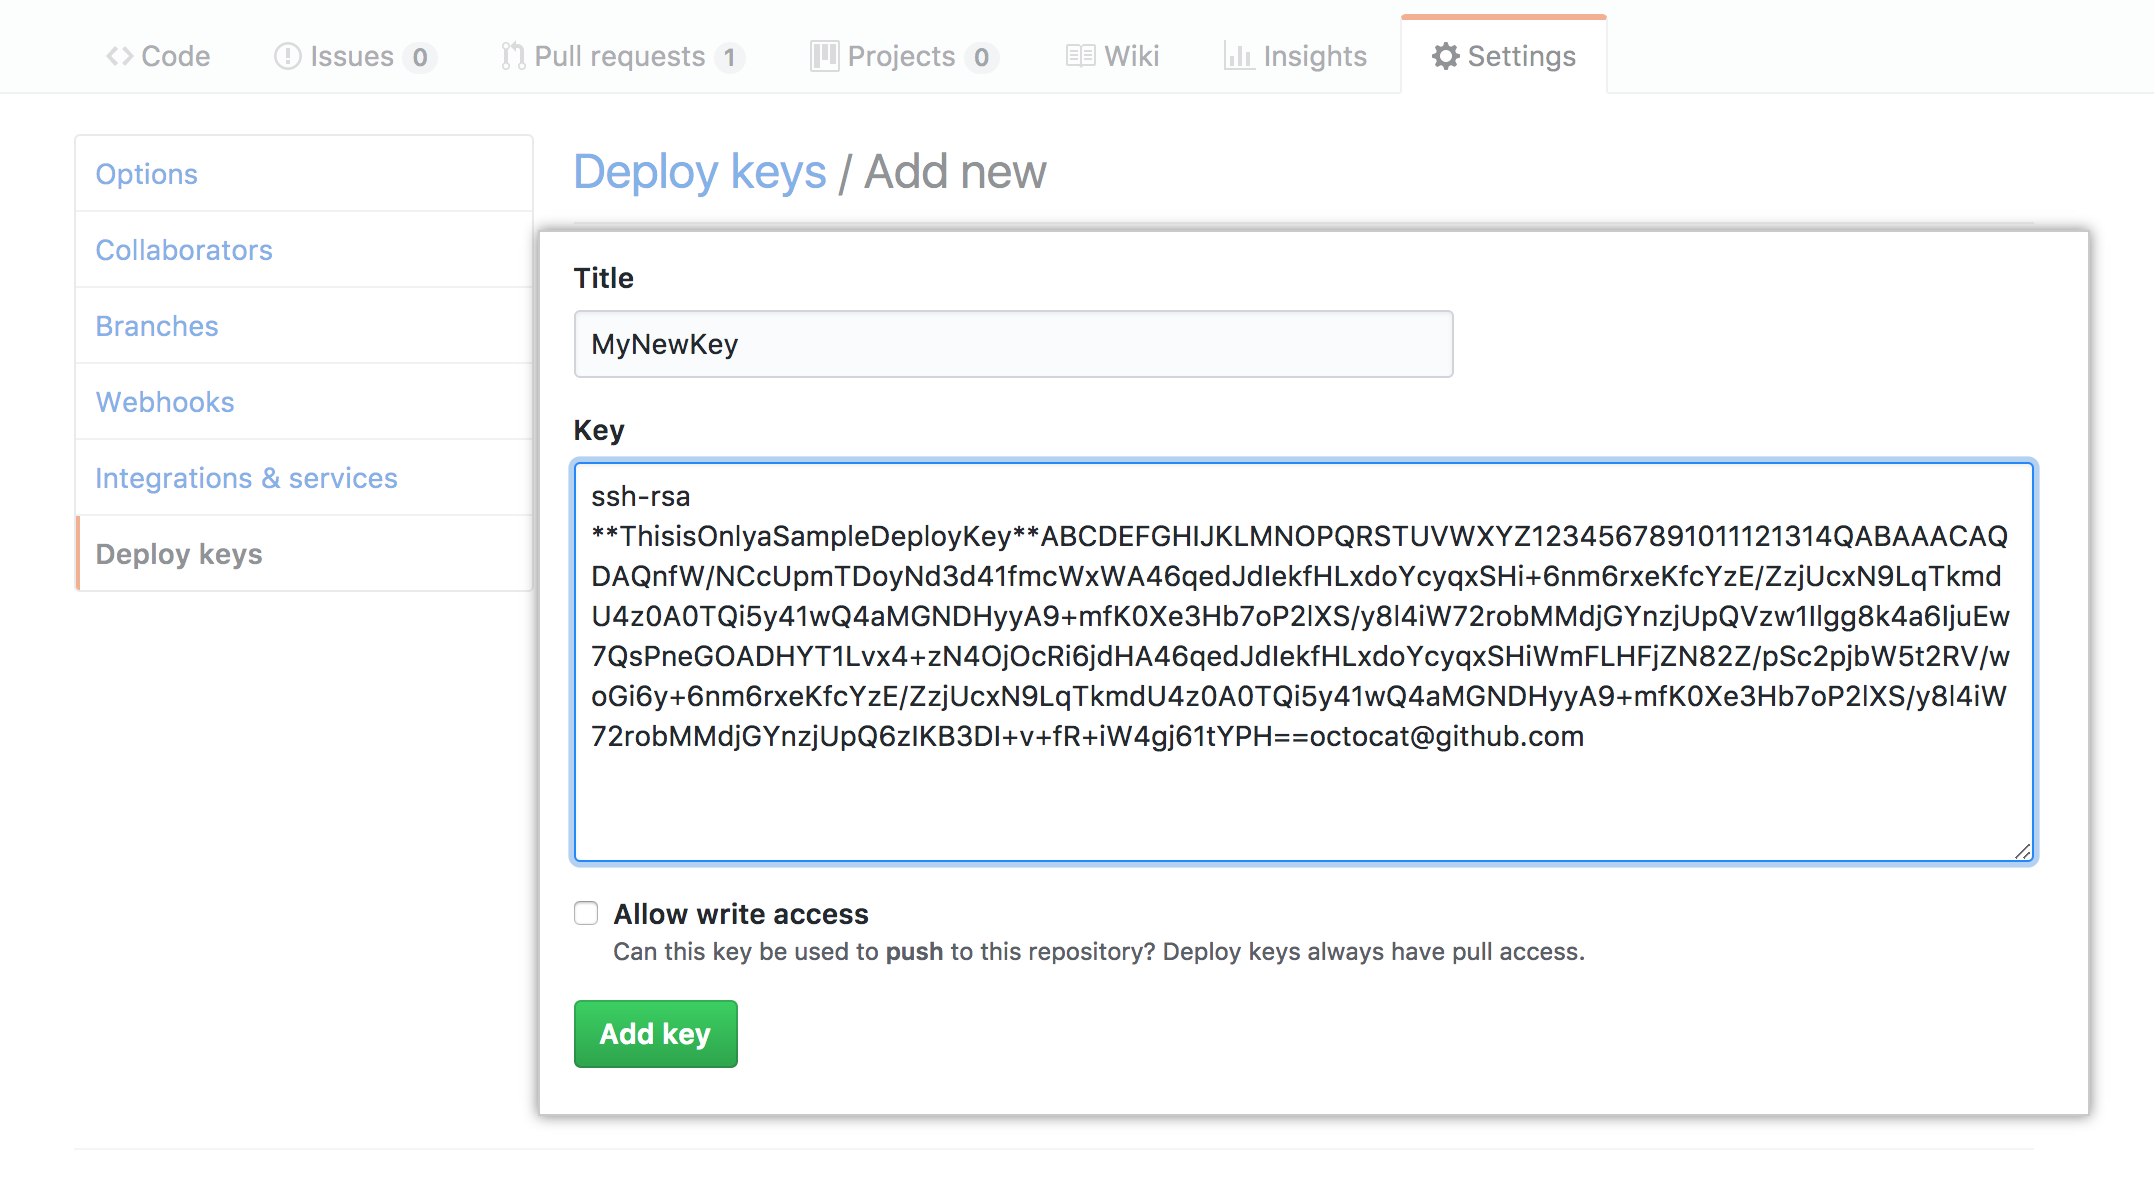 pgp keygen public key cannot read